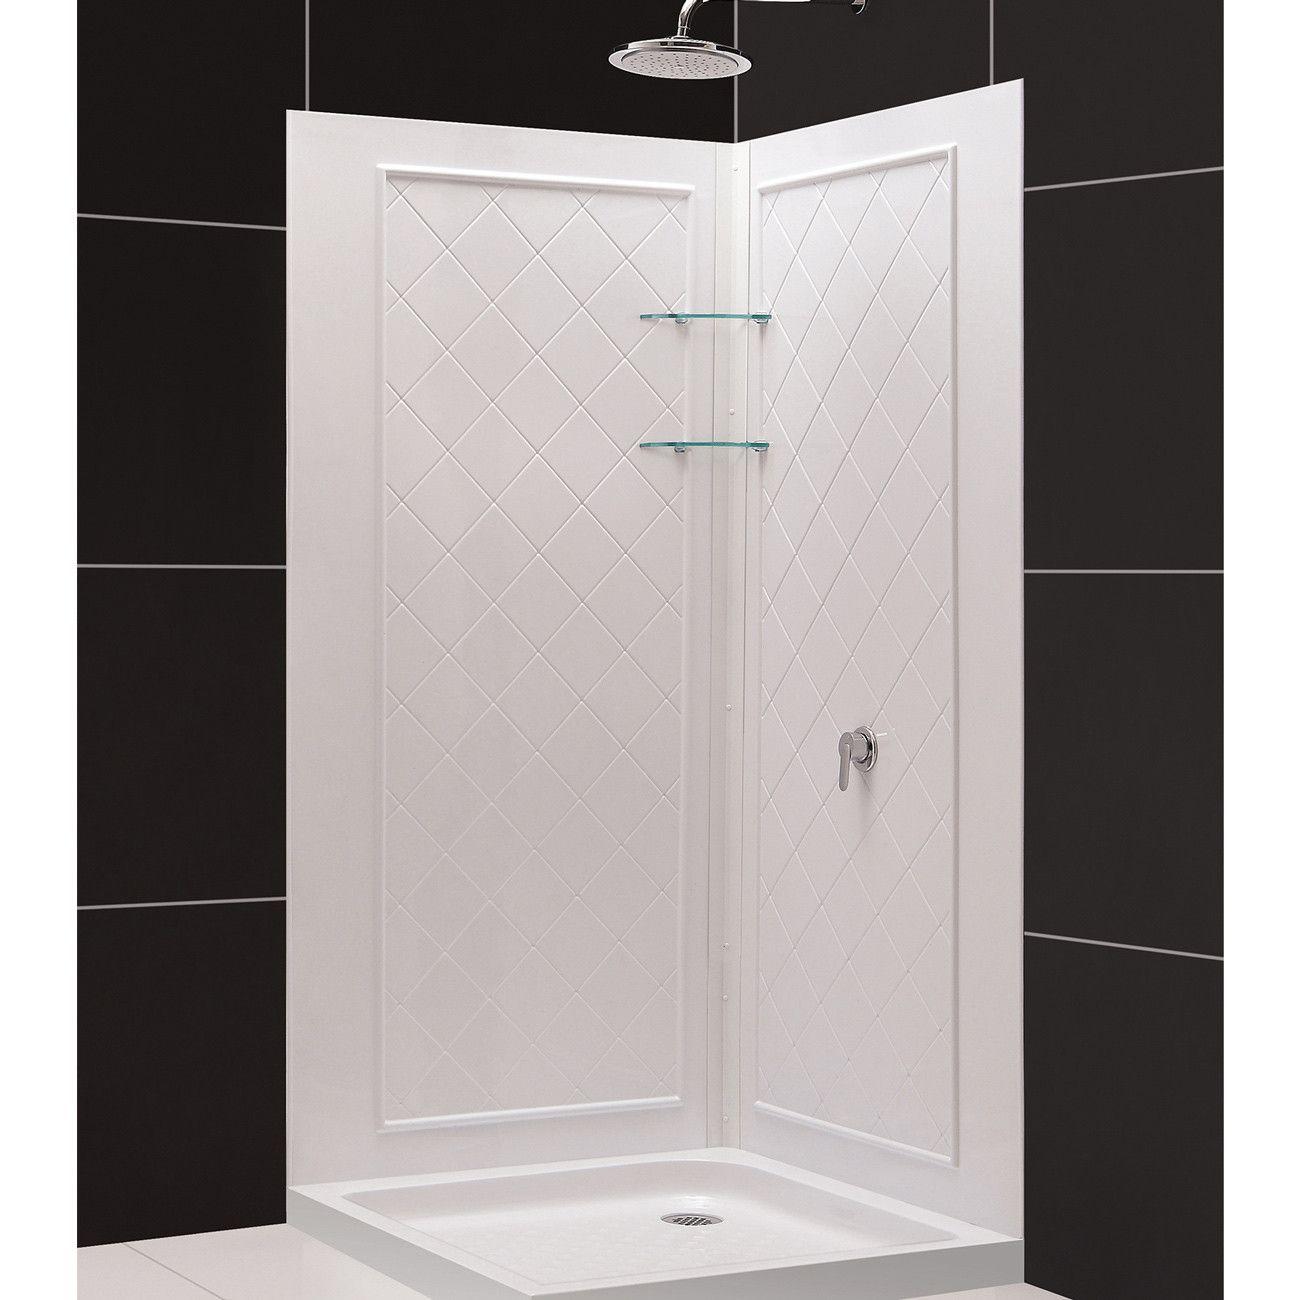 Dreamline Shbw 1440742 01 Qwall 4 Shower Enclosure Backwall